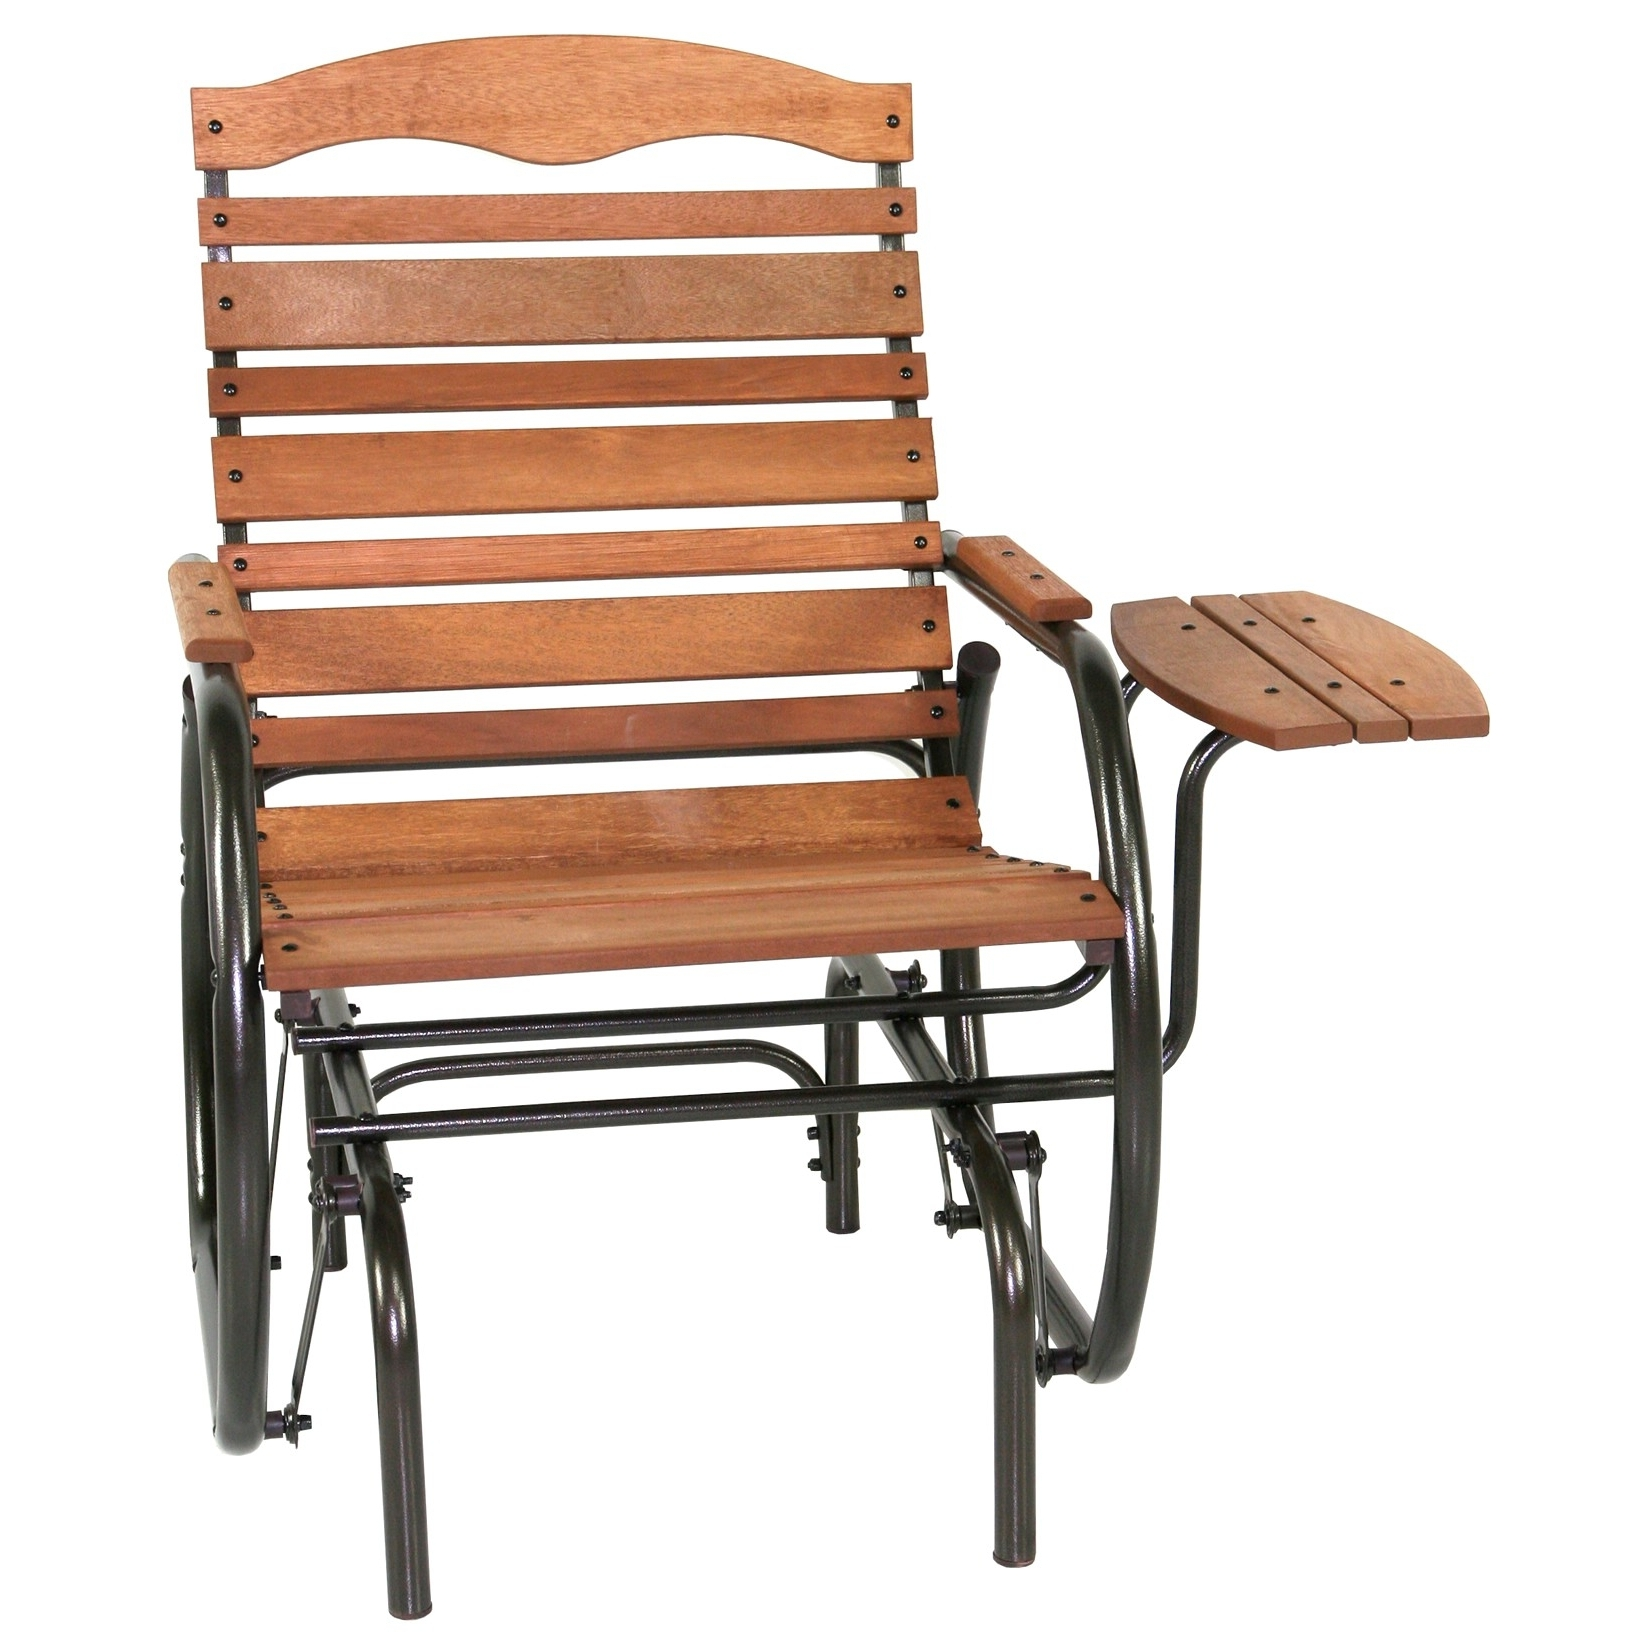 Favorite Outdoor Furniture Sets Target Elegant Tar Rocking Chair Baby In Within Rocking Chairs At Wayfair (View 17 of 20)